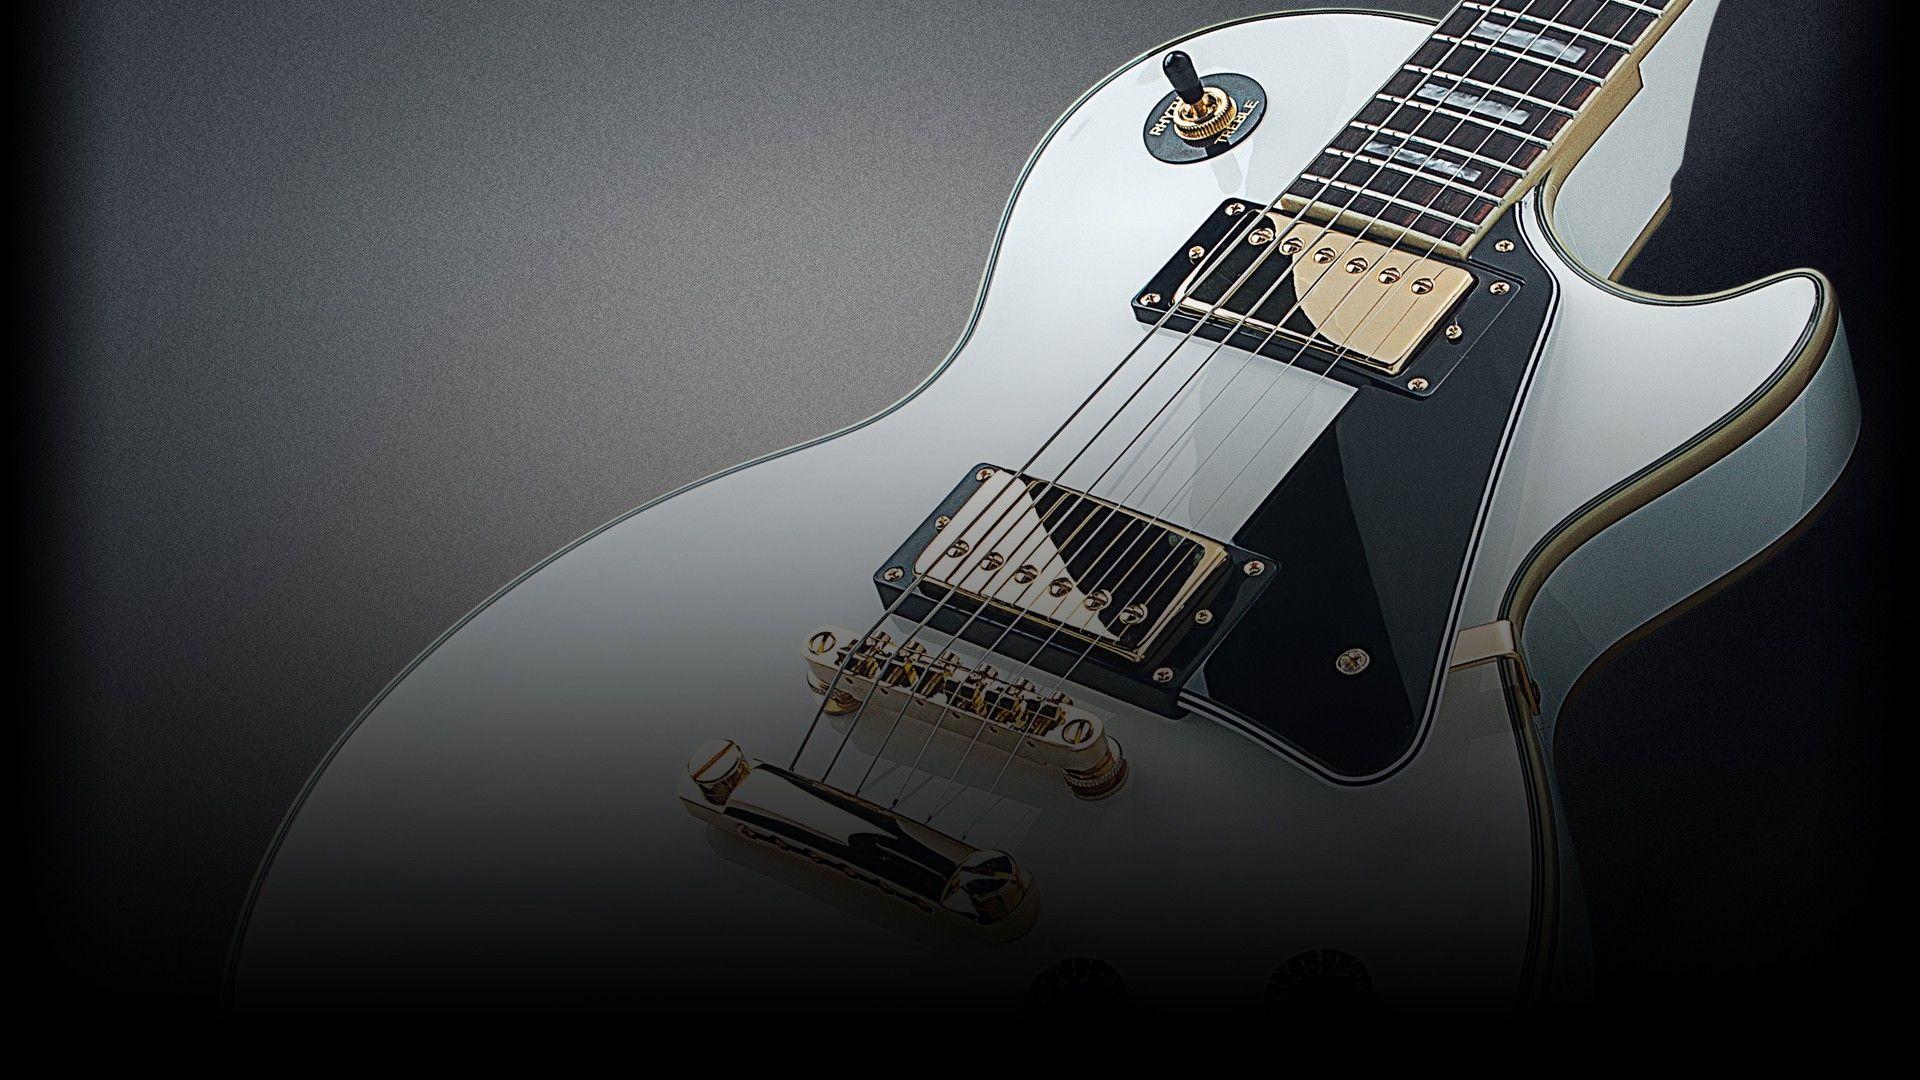 Electric Guitar white, Good Wallpaper